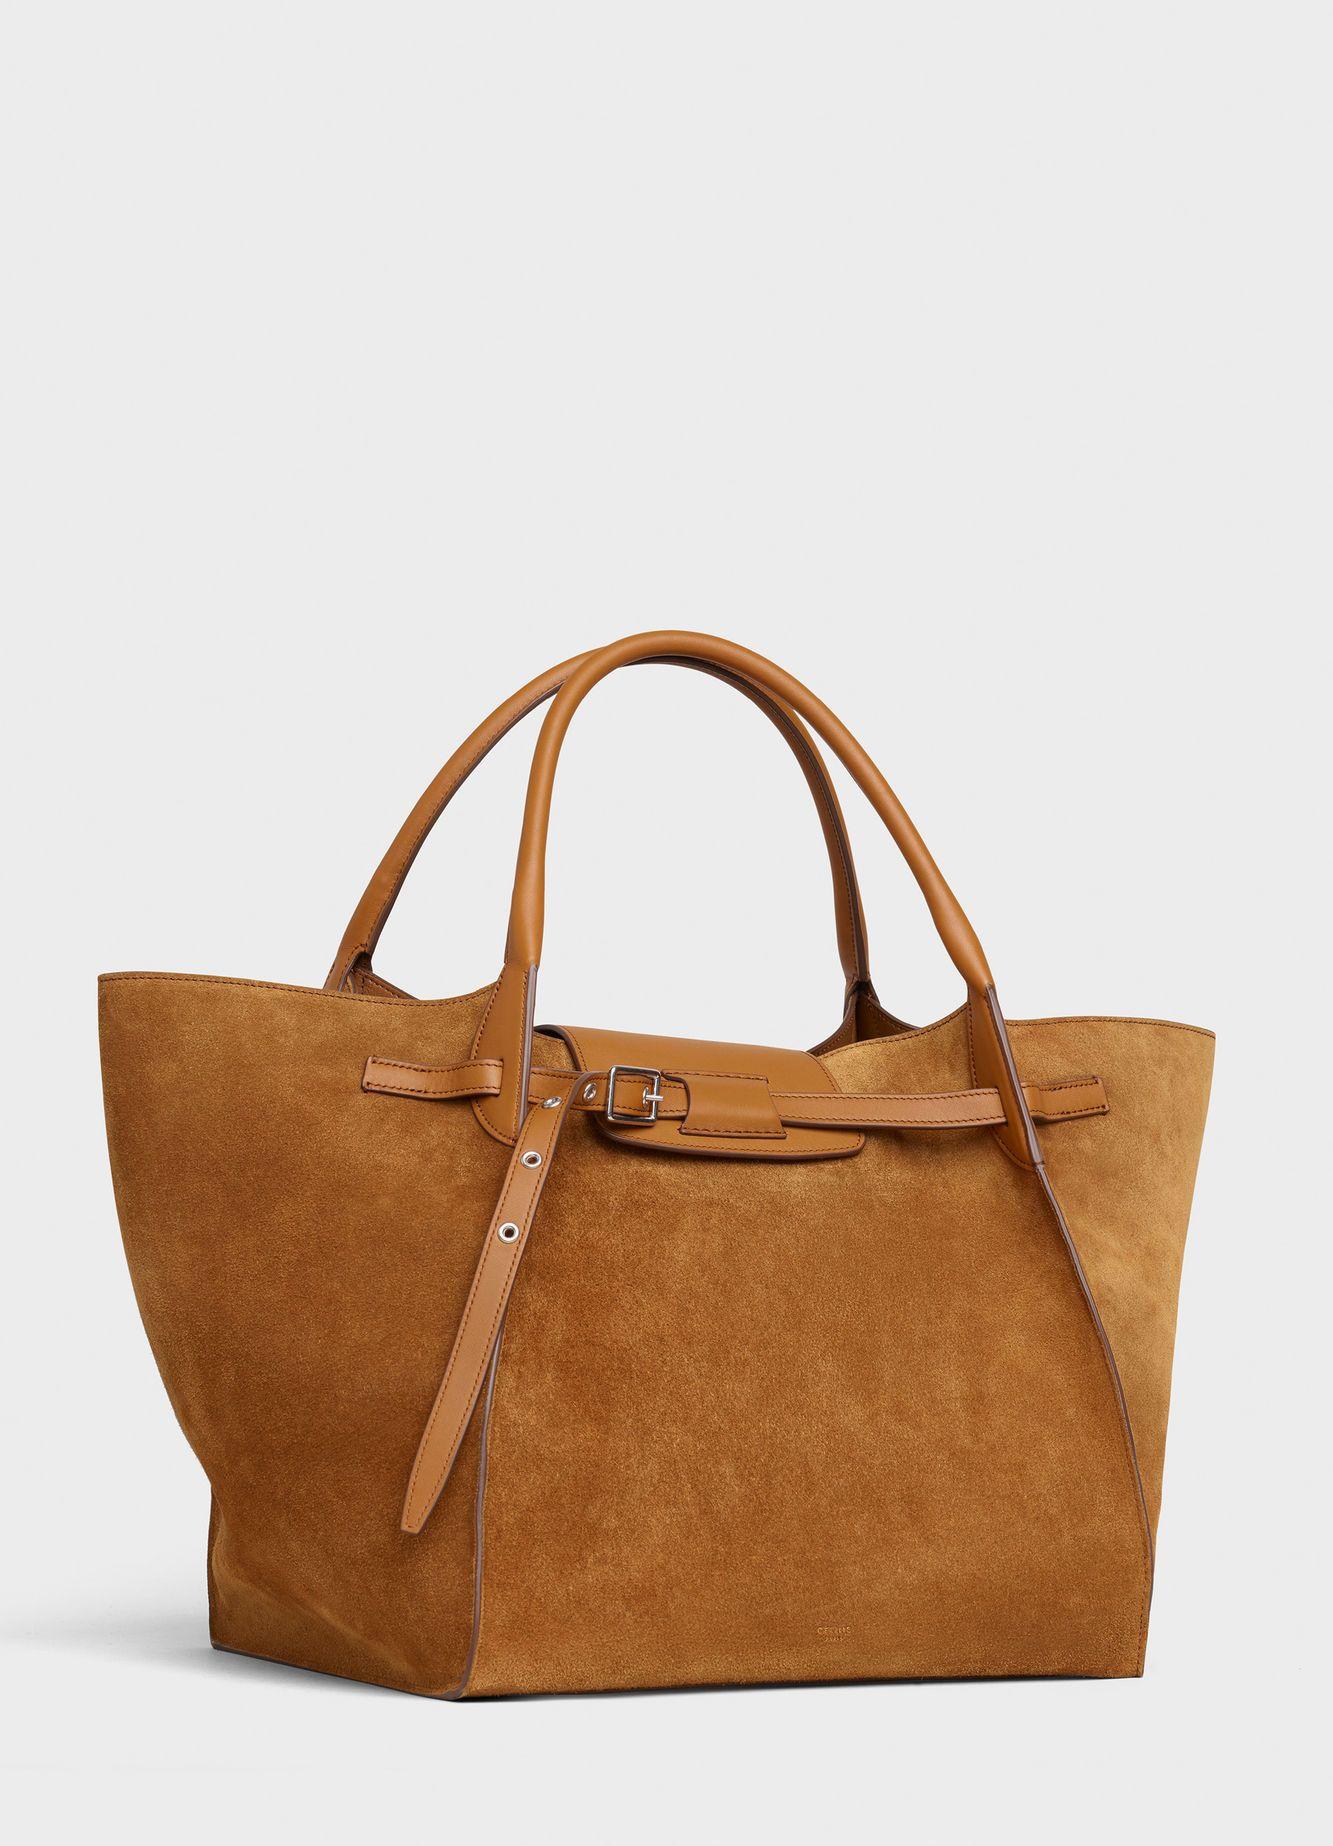 fd9de436f5be Céline - Medium Big Bag in camel suede calfskin